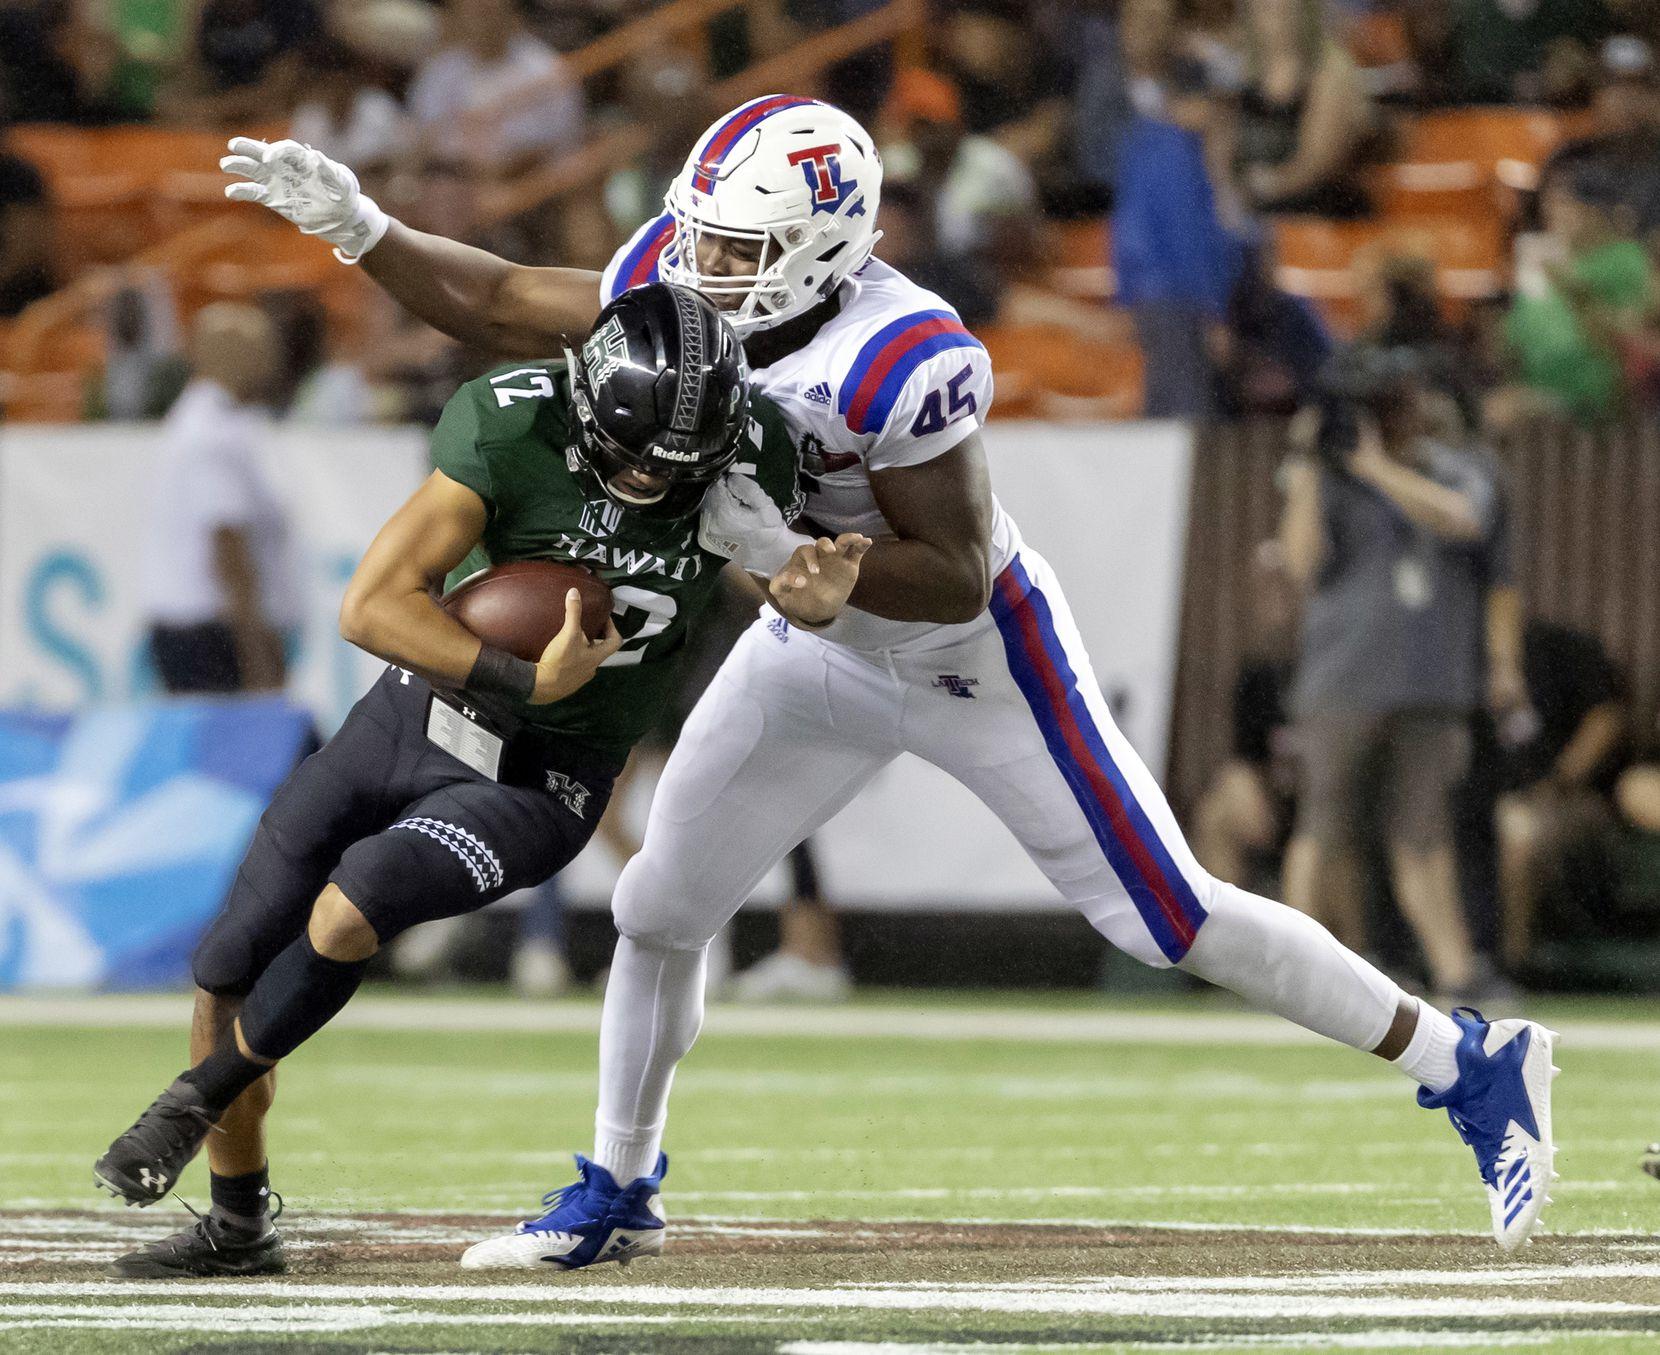 FILE - Louisiana Tech defensive end Jaylon Ferguson (45) sacks Hawaii quarterback Chevan Cordeiro (12) in the first half of the Hawaii Bowl NCAA college football game, Saturday, Dec. 22, 2018, in Honolulu. (AP Photo/Eugene Tanner)